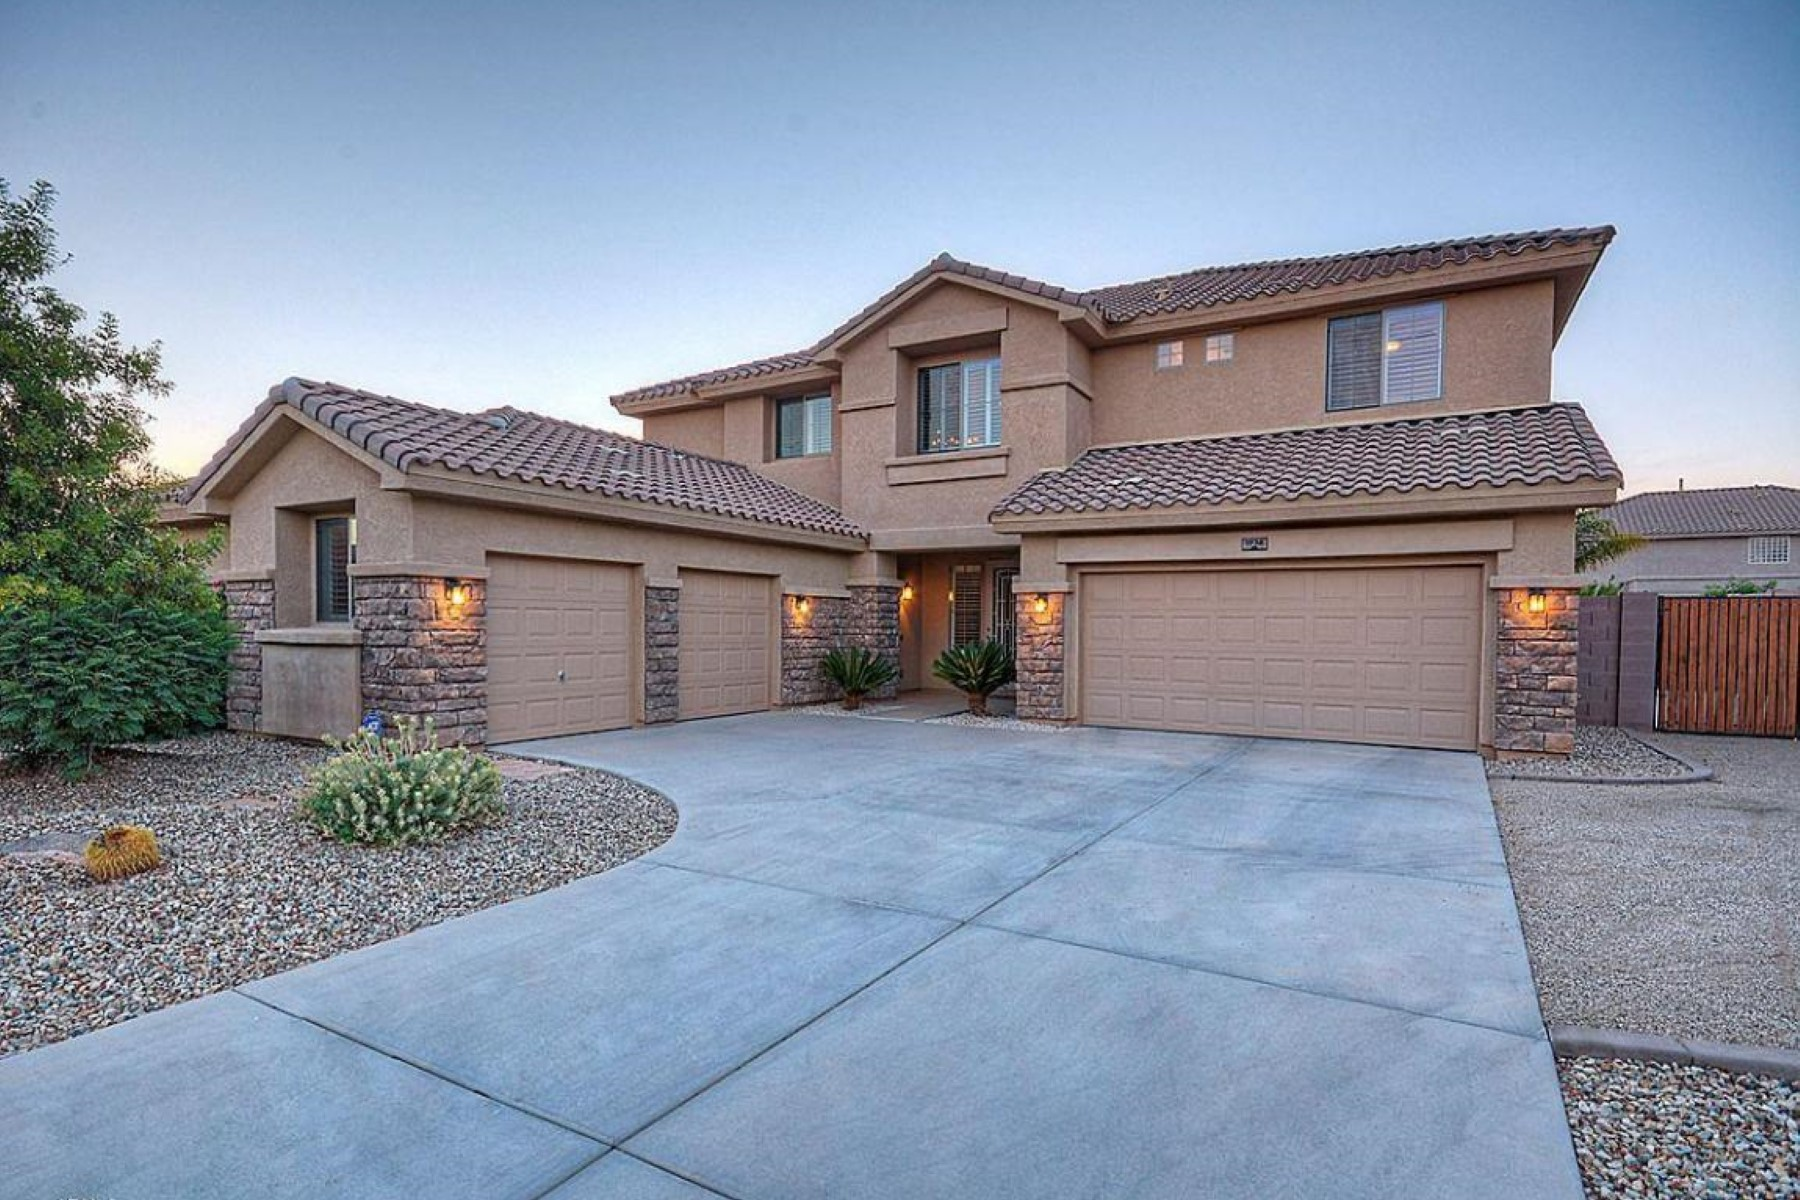 Single Family Home for Sale at Spectacular, cherished home. 1938 W MAYA WAY Phoenix, Arizona 85085 United States